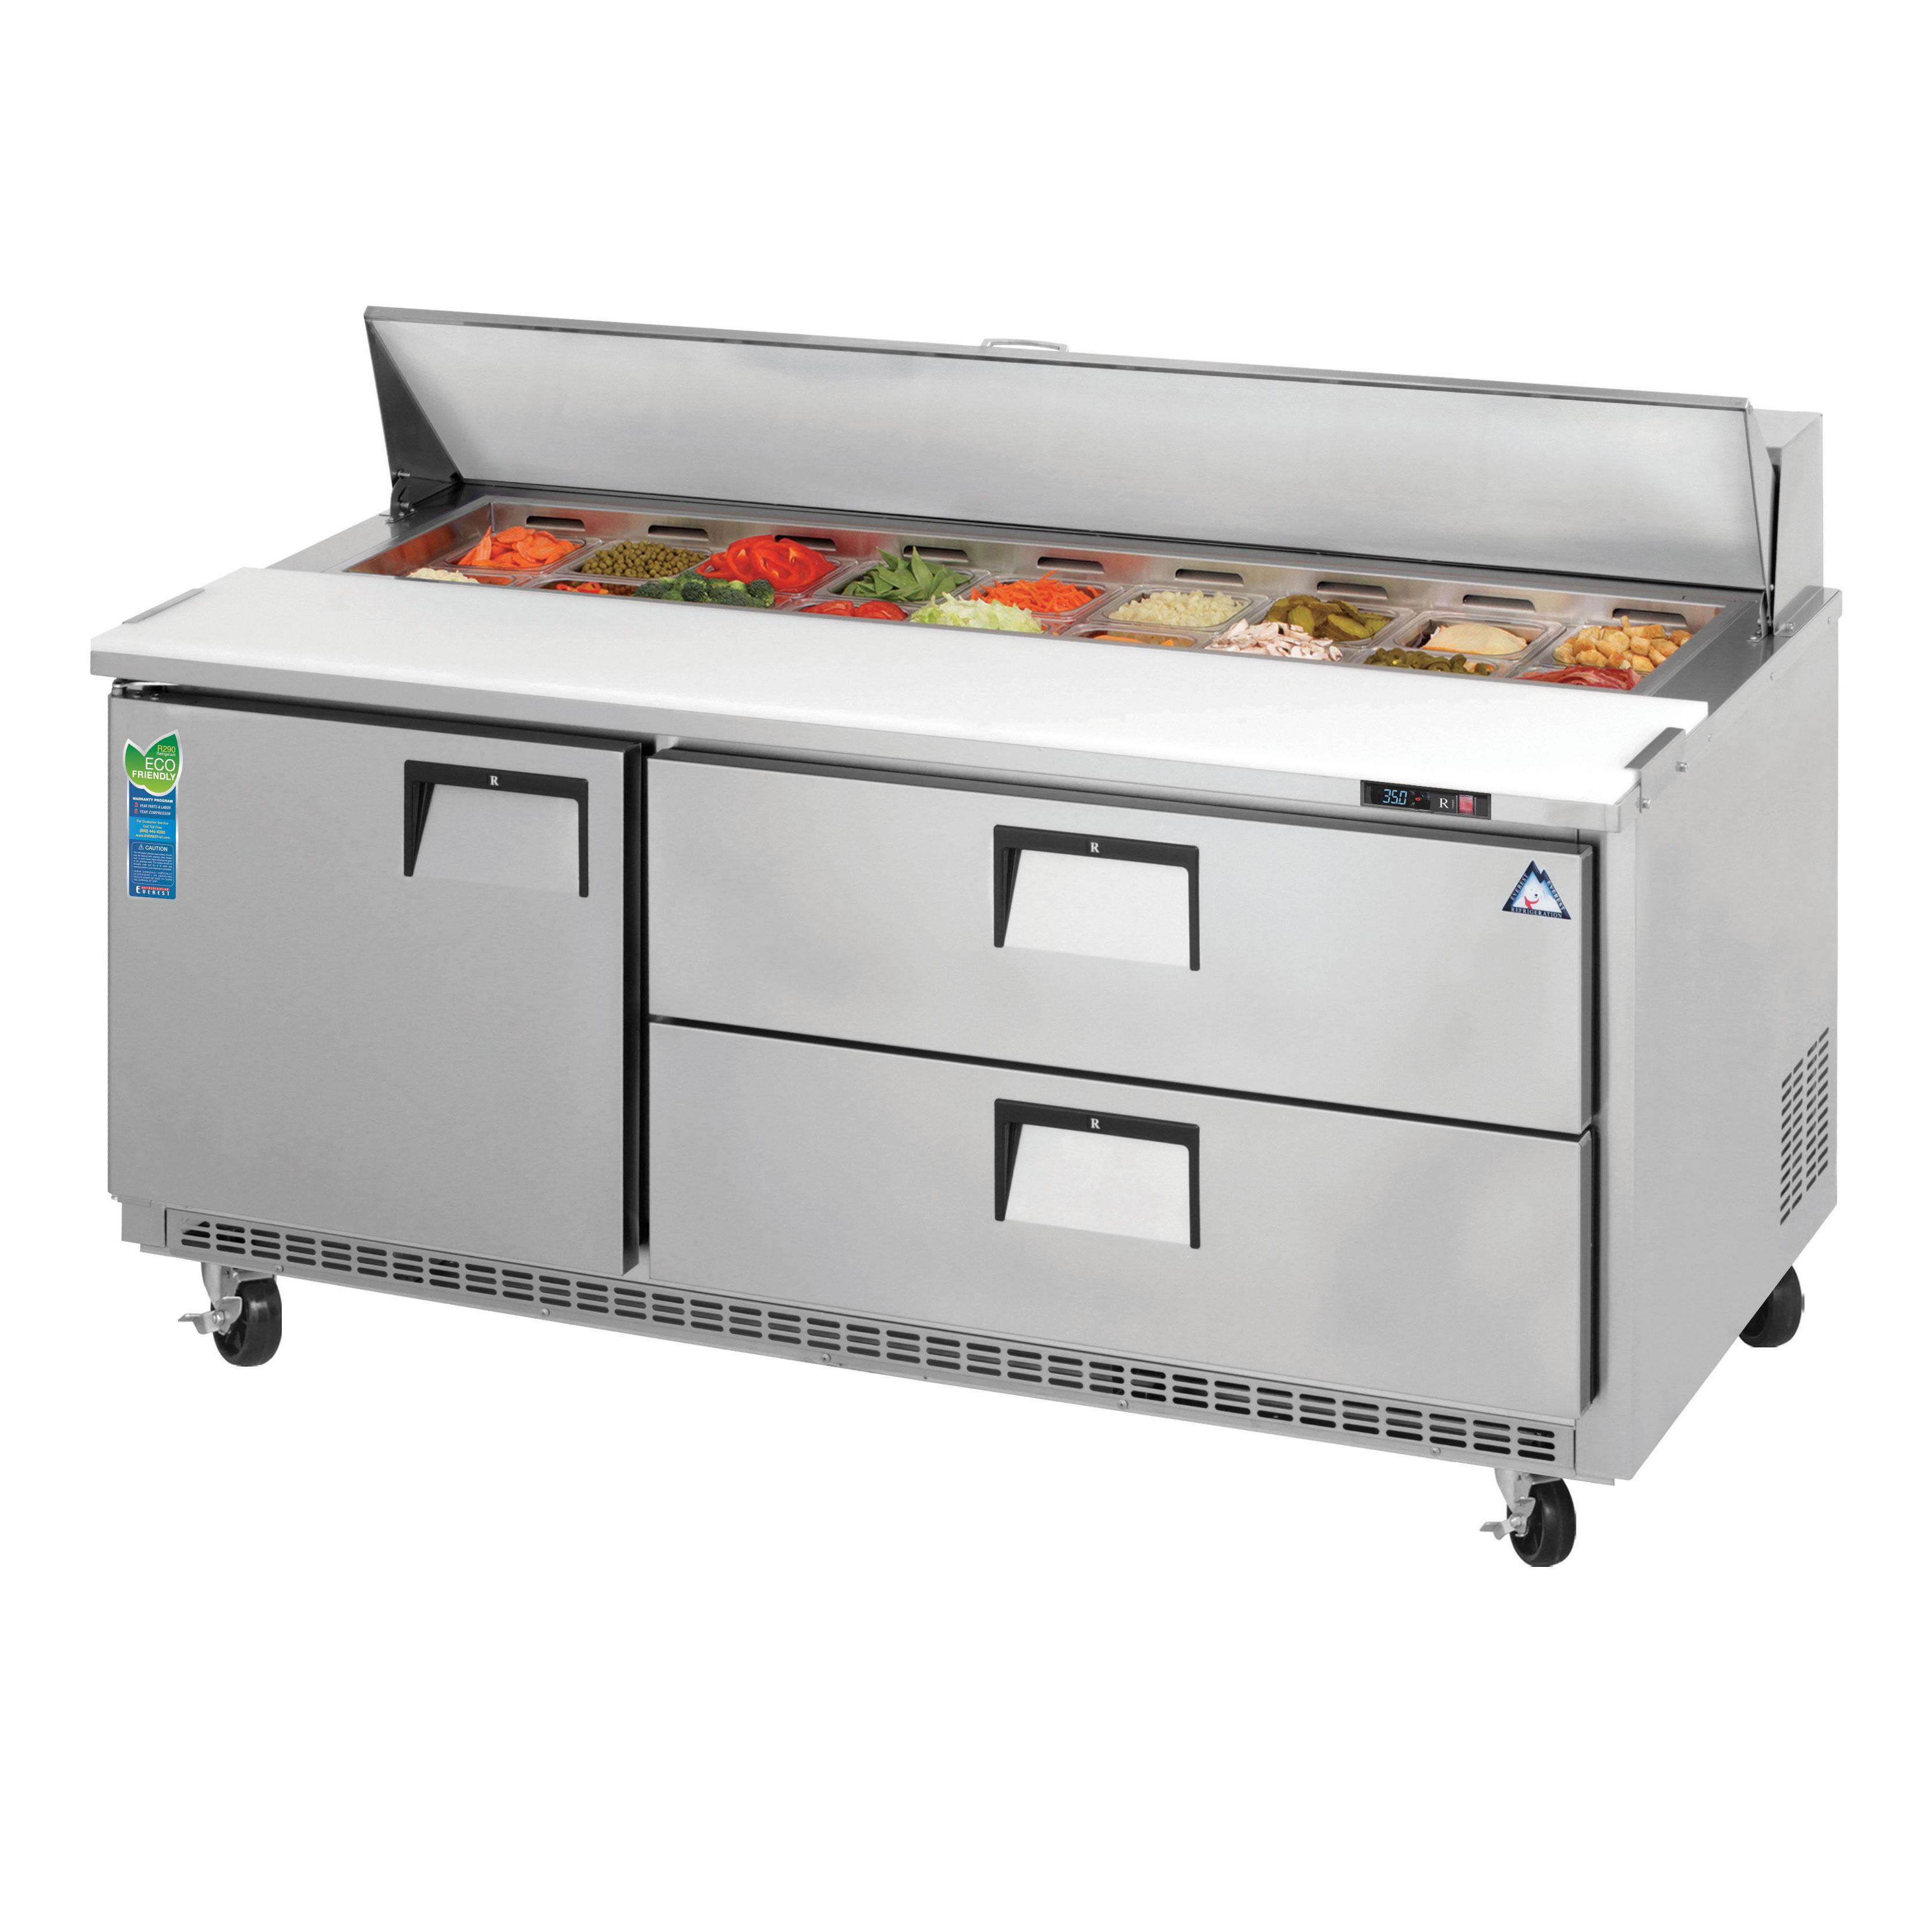 Everest Refrigeration EPBNR3-D2 refrigerated counter, sandwich / salad unit